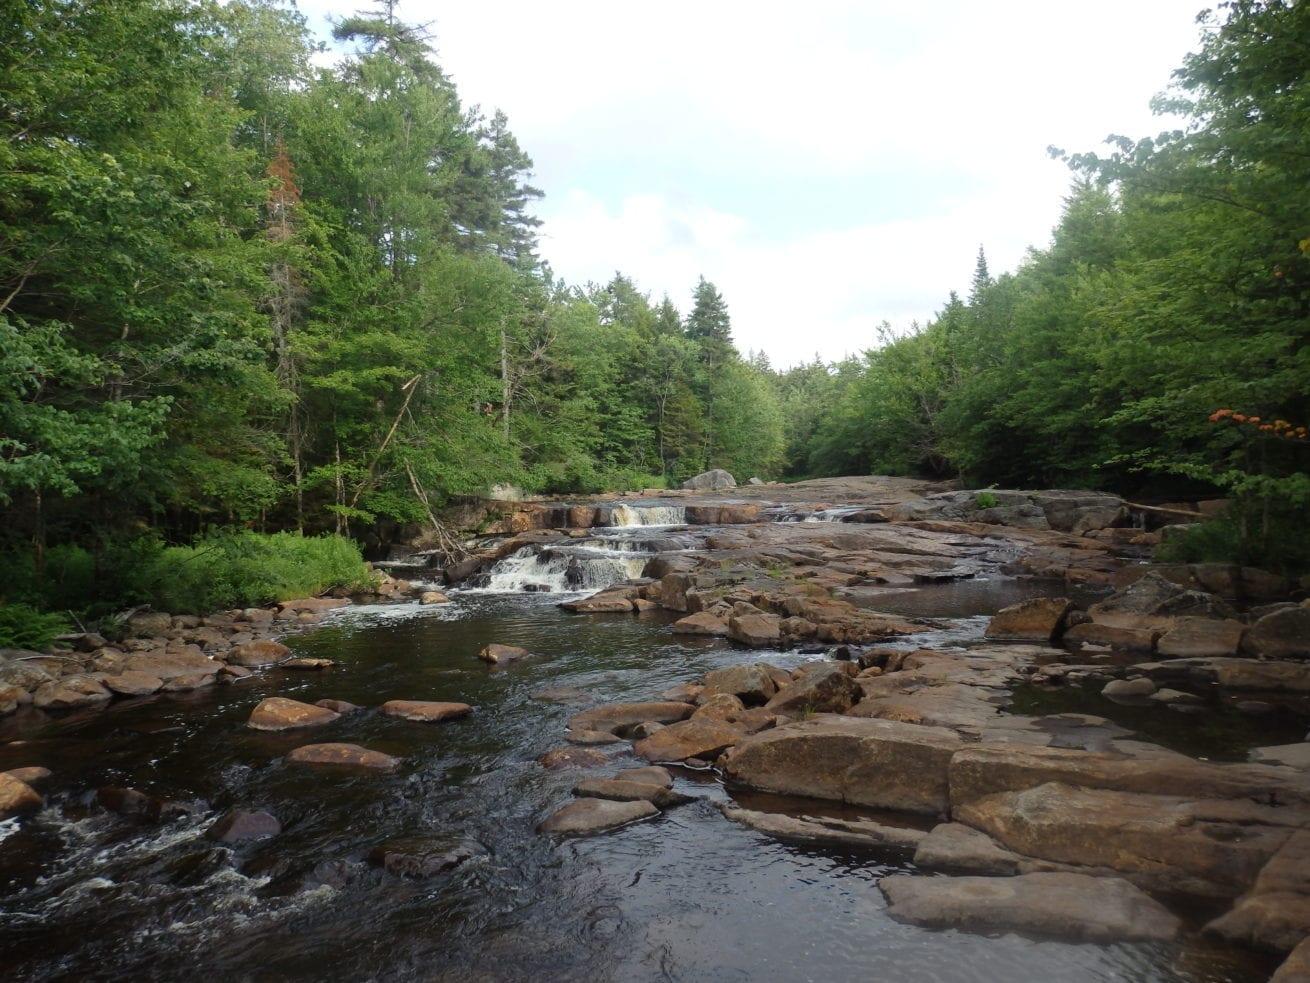 Twitchell Creek - Falls #2 - Eagle Bay, Herkimer County, New York